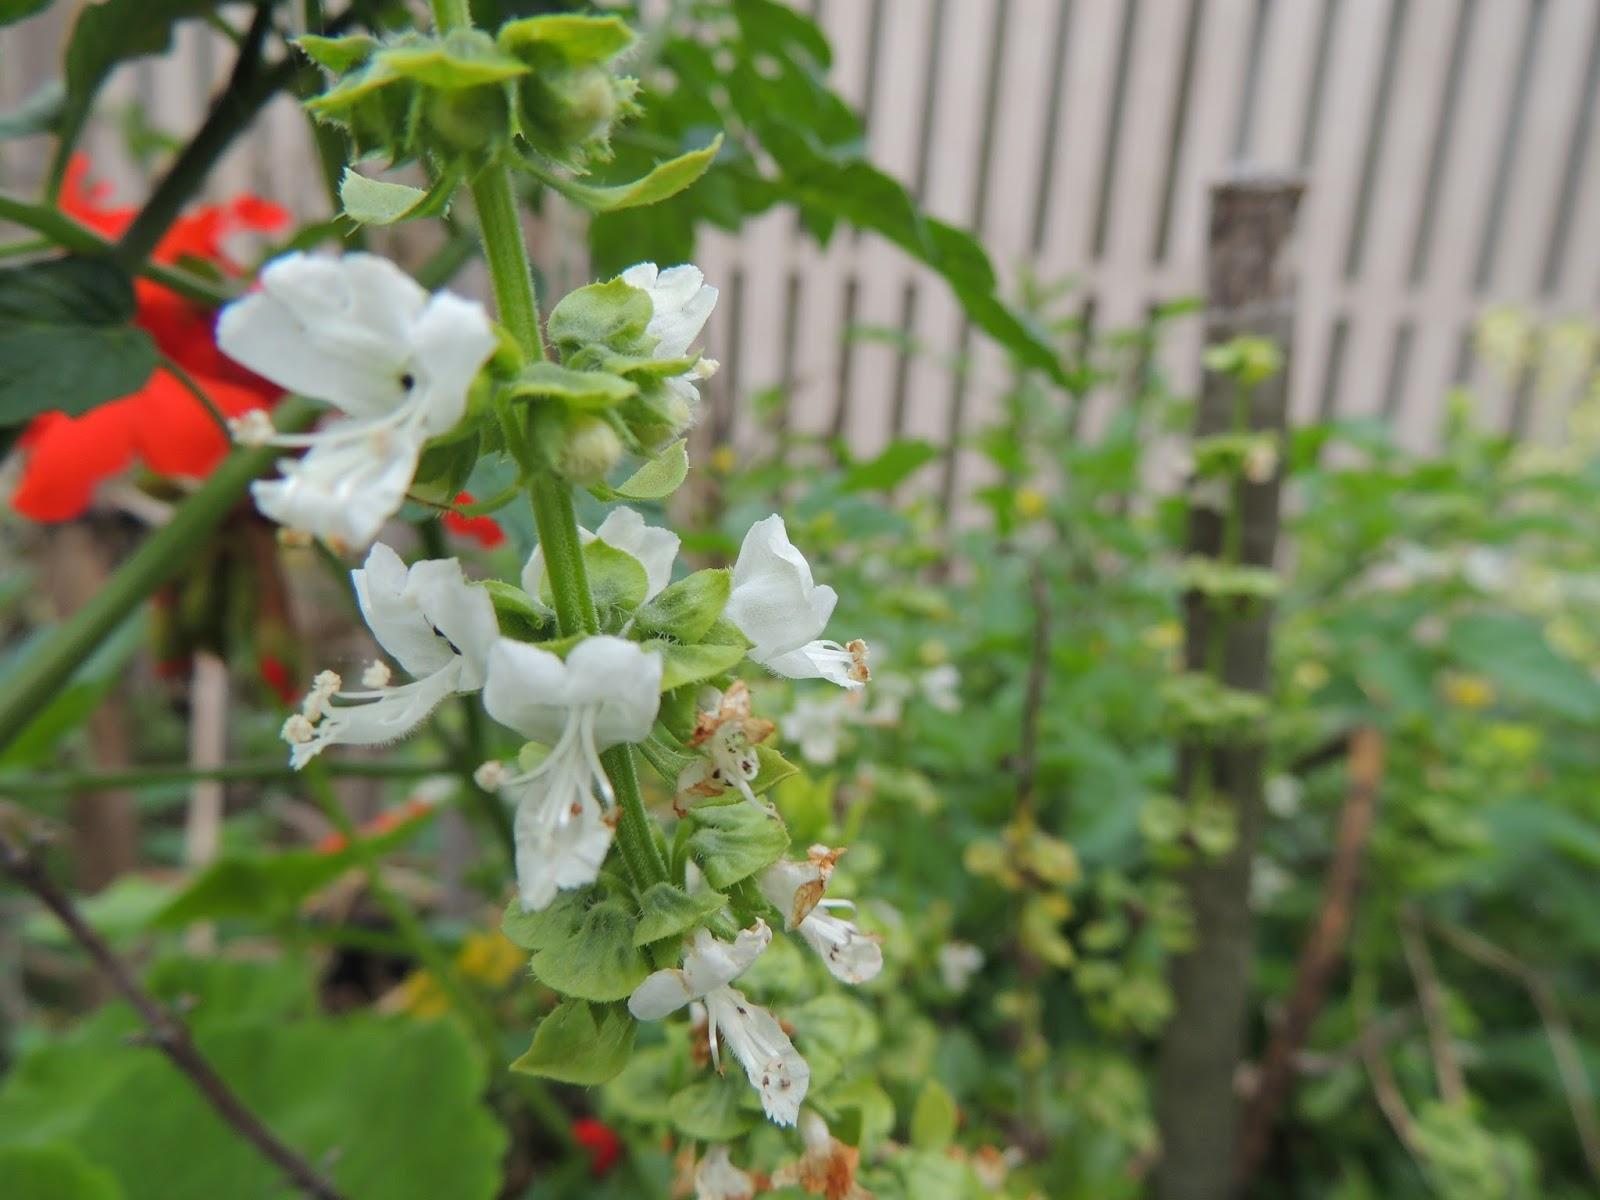 Whitecottage flowers make me happy Flowers that make you happy